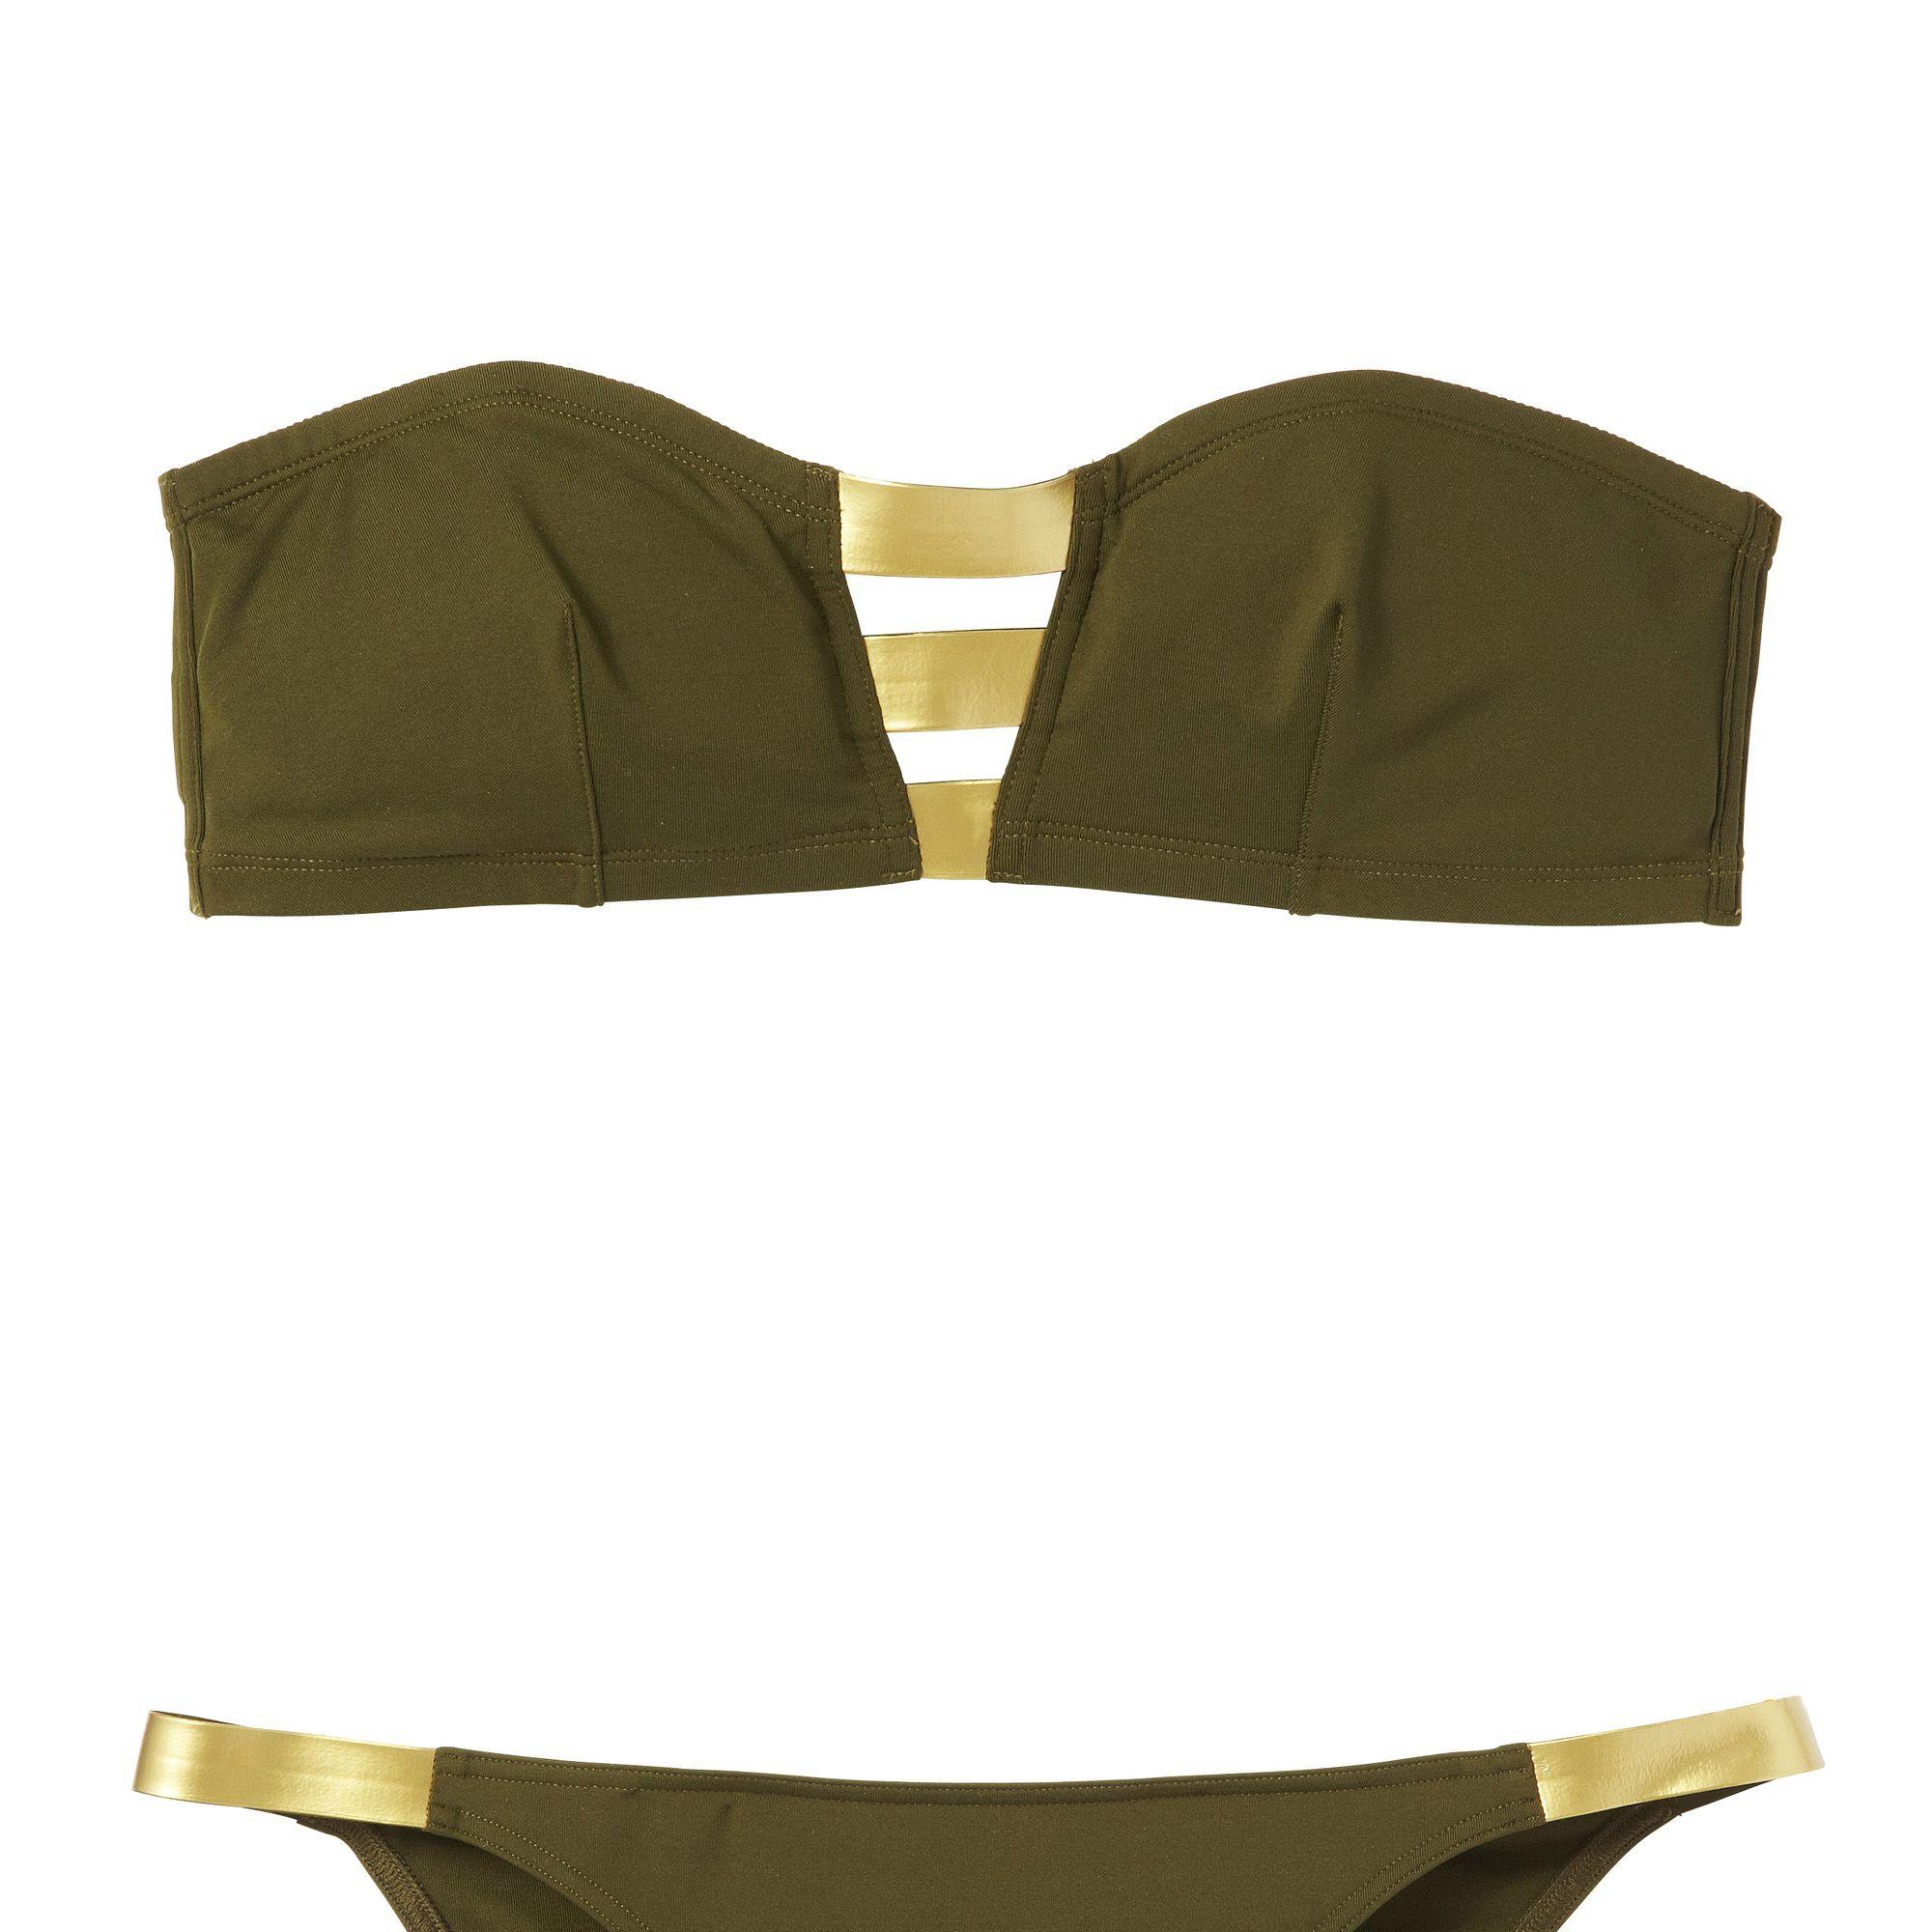 <strong>Eres</strong> bikini top, $275, and bottom, $195, 888-865-ERES.